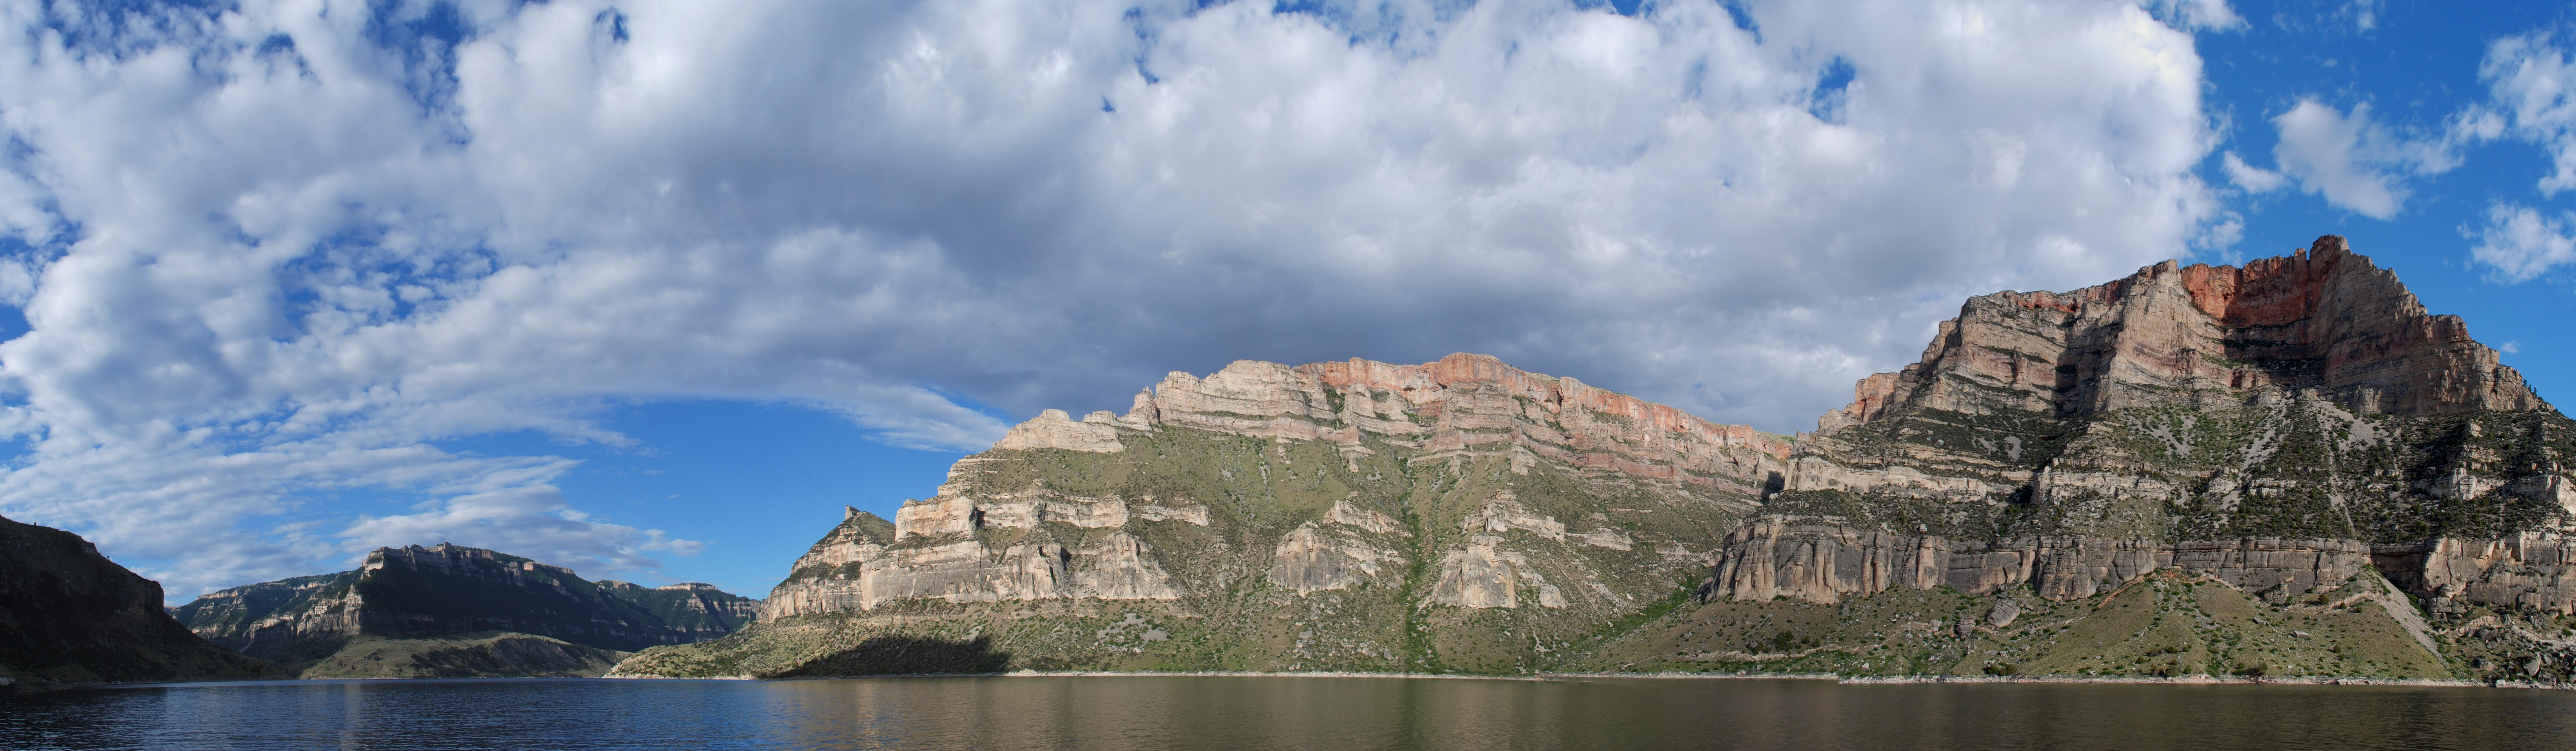 Bighorn Canyon National Recreation Area (U.S. National Park Service)